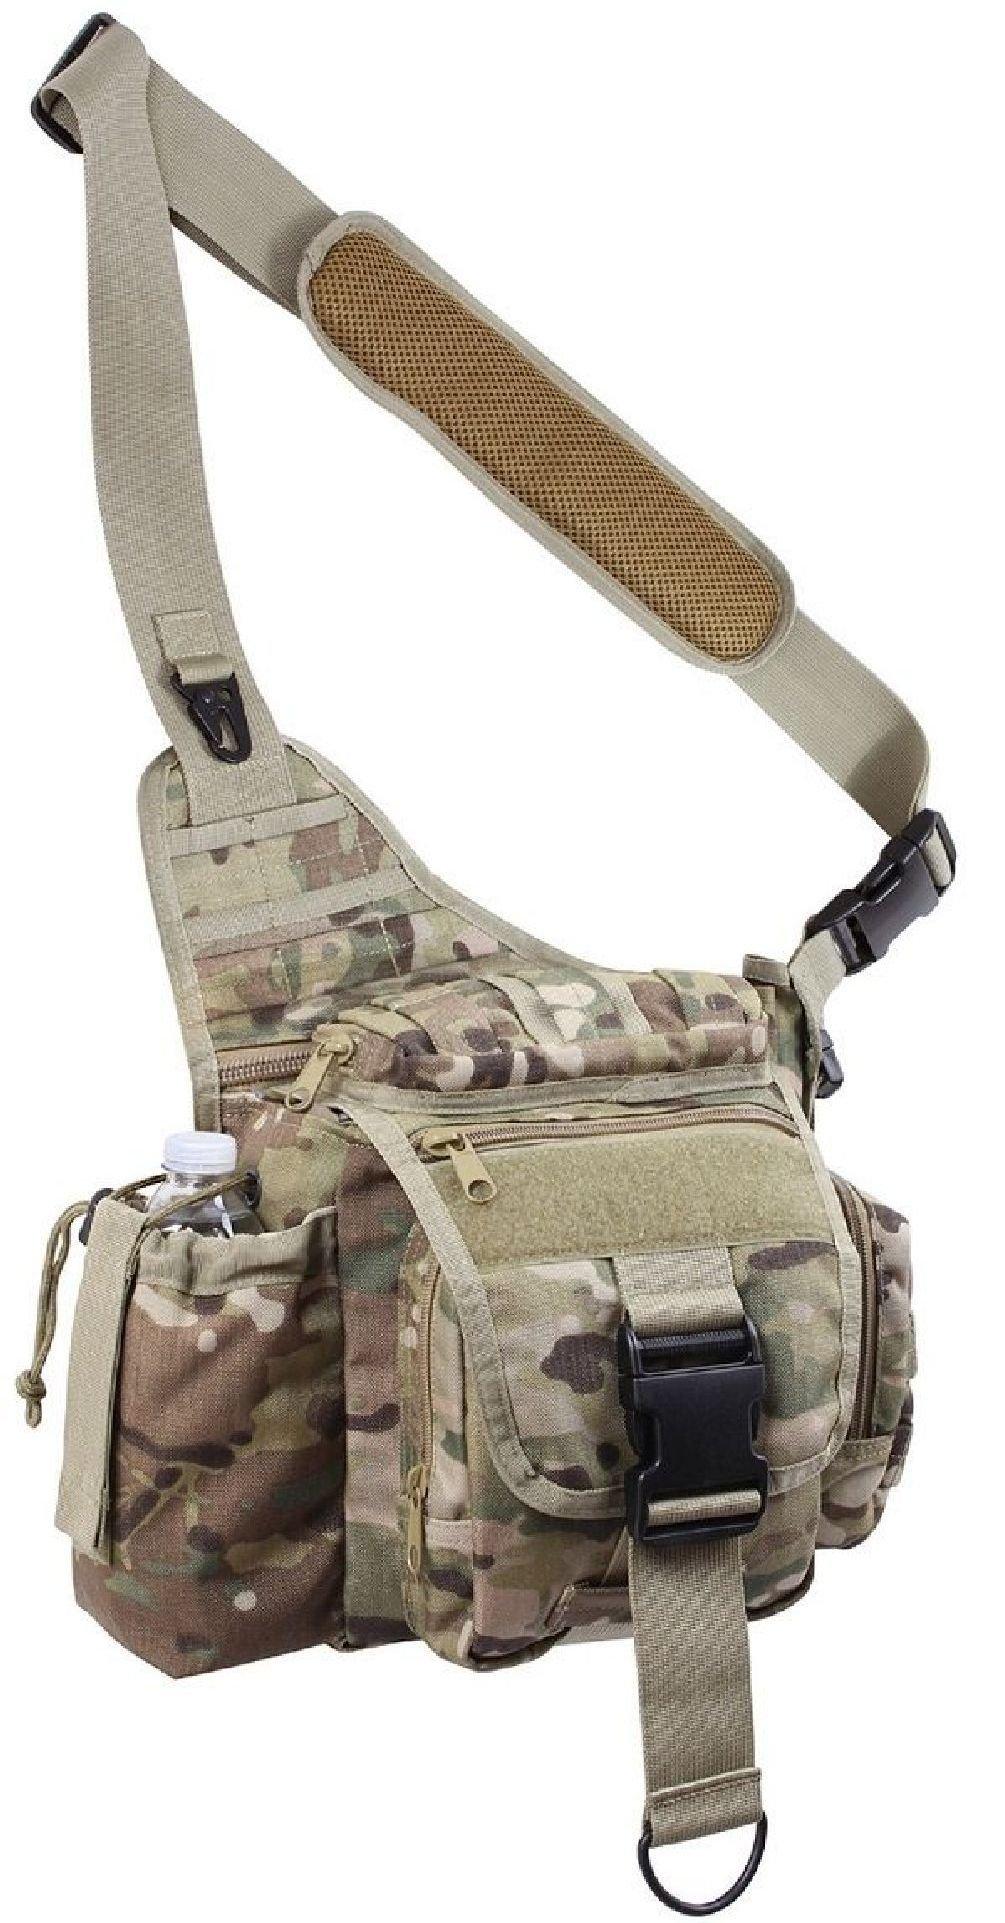 Camouflage Lightweight Molle Advanced Tactical Travel Shoulder Bag